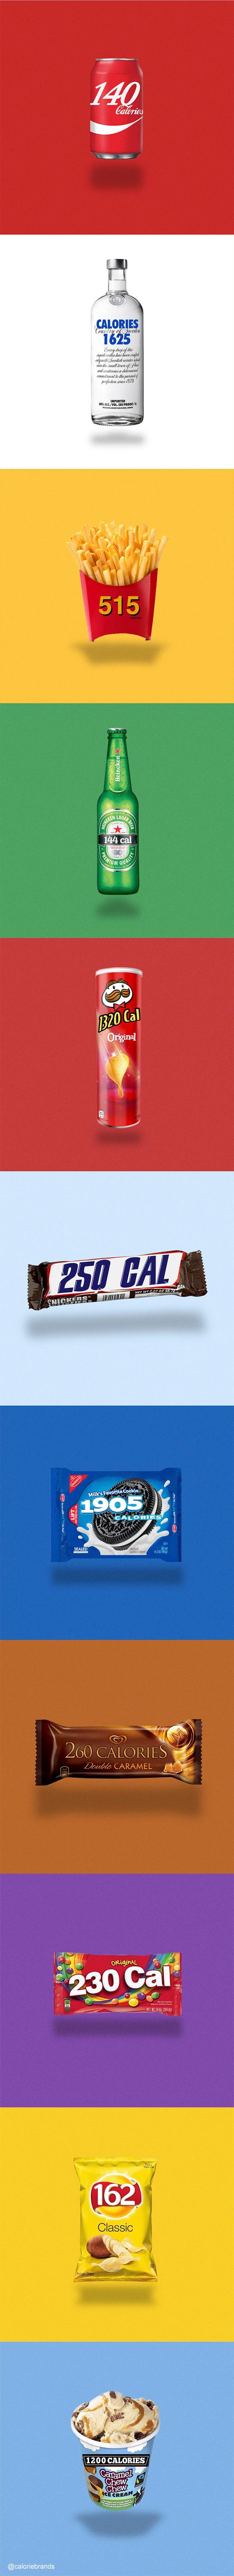 calorie-brands_02 (1)